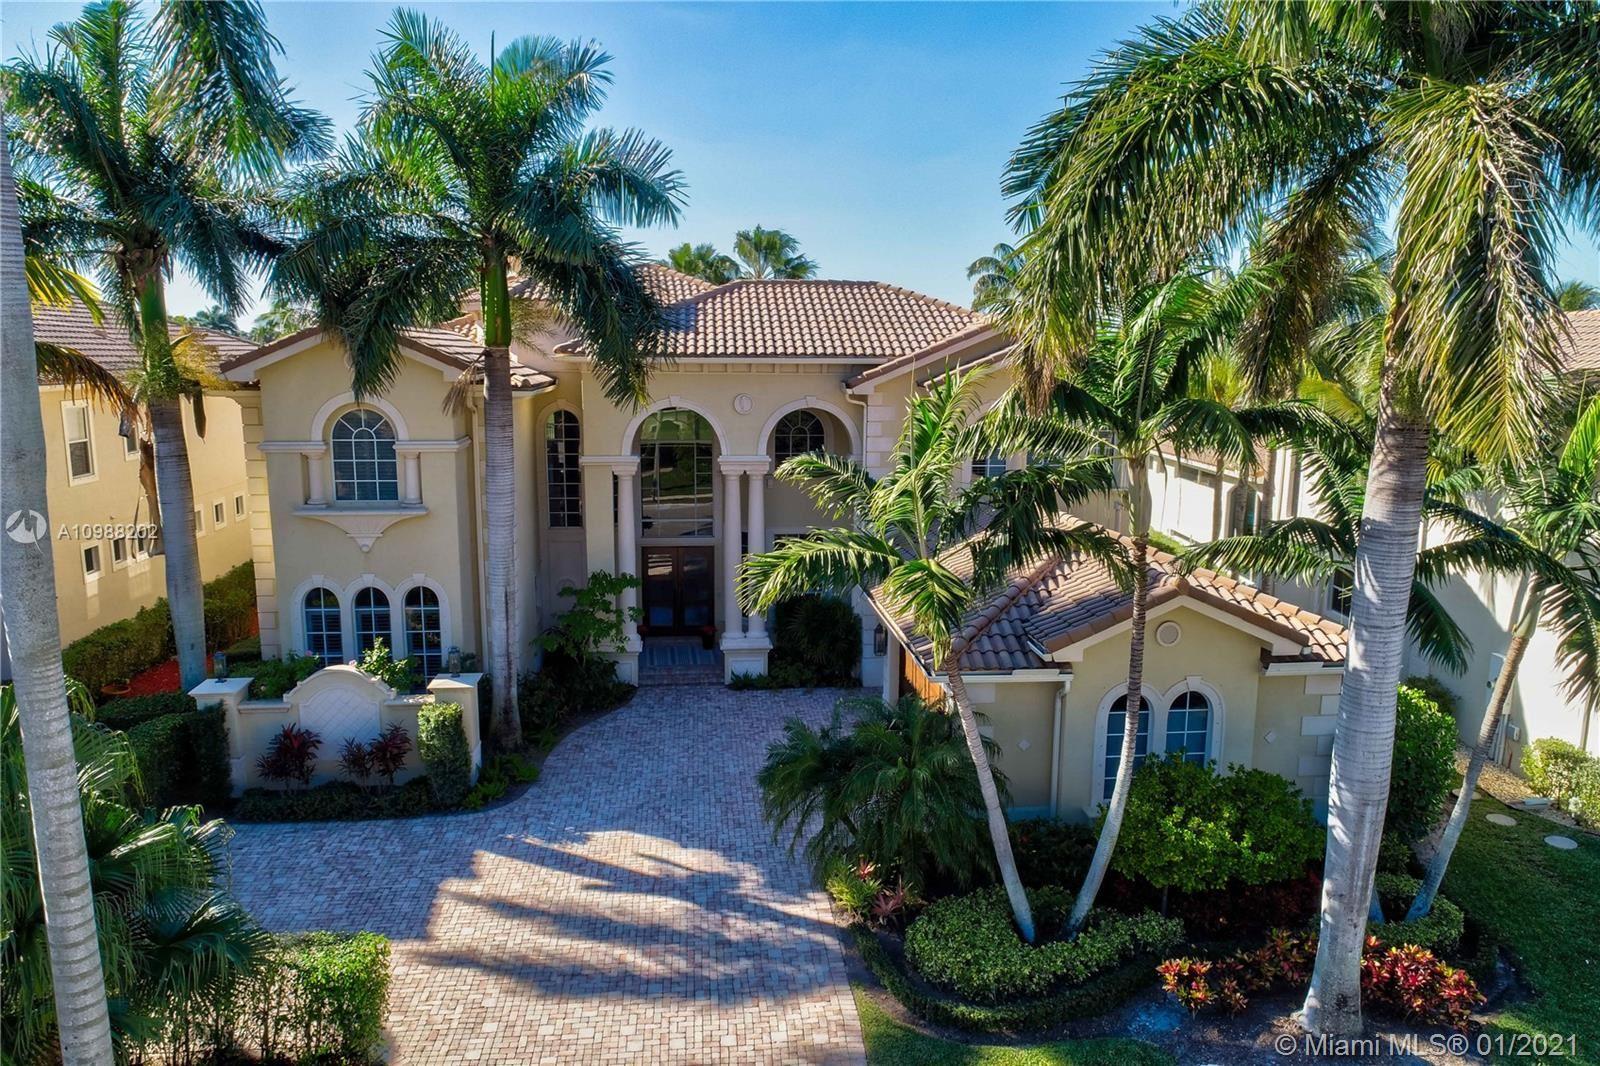 Photo of 421 Savoie Dr, Palm Beach Gardens, FL 33410 (MLS # A10988202)